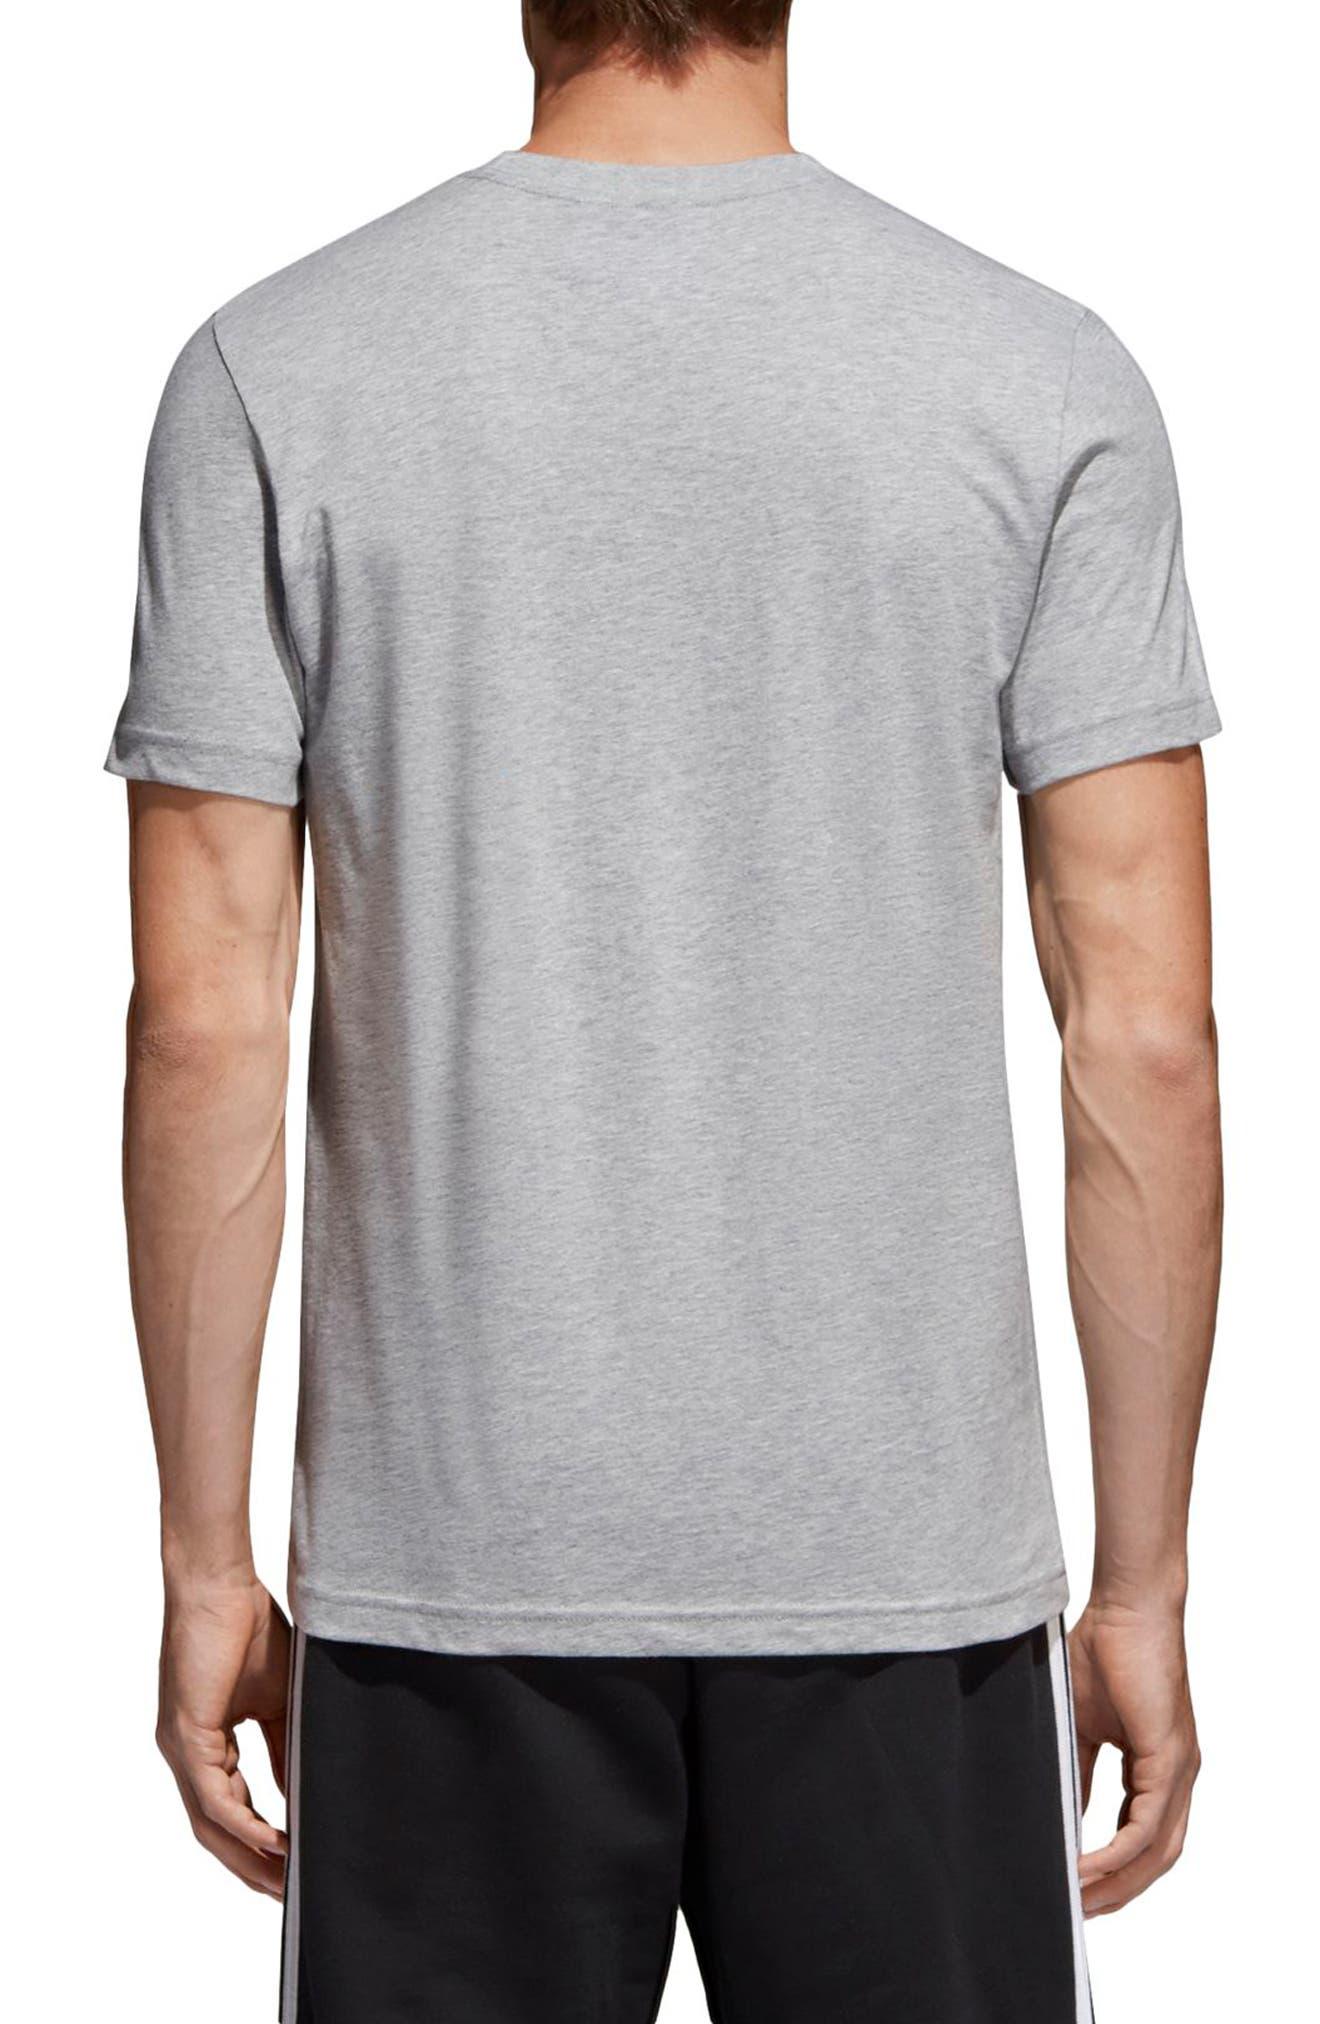 Tongue Label T-Shirt,                             Alternate thumbnail 2, color,                             035